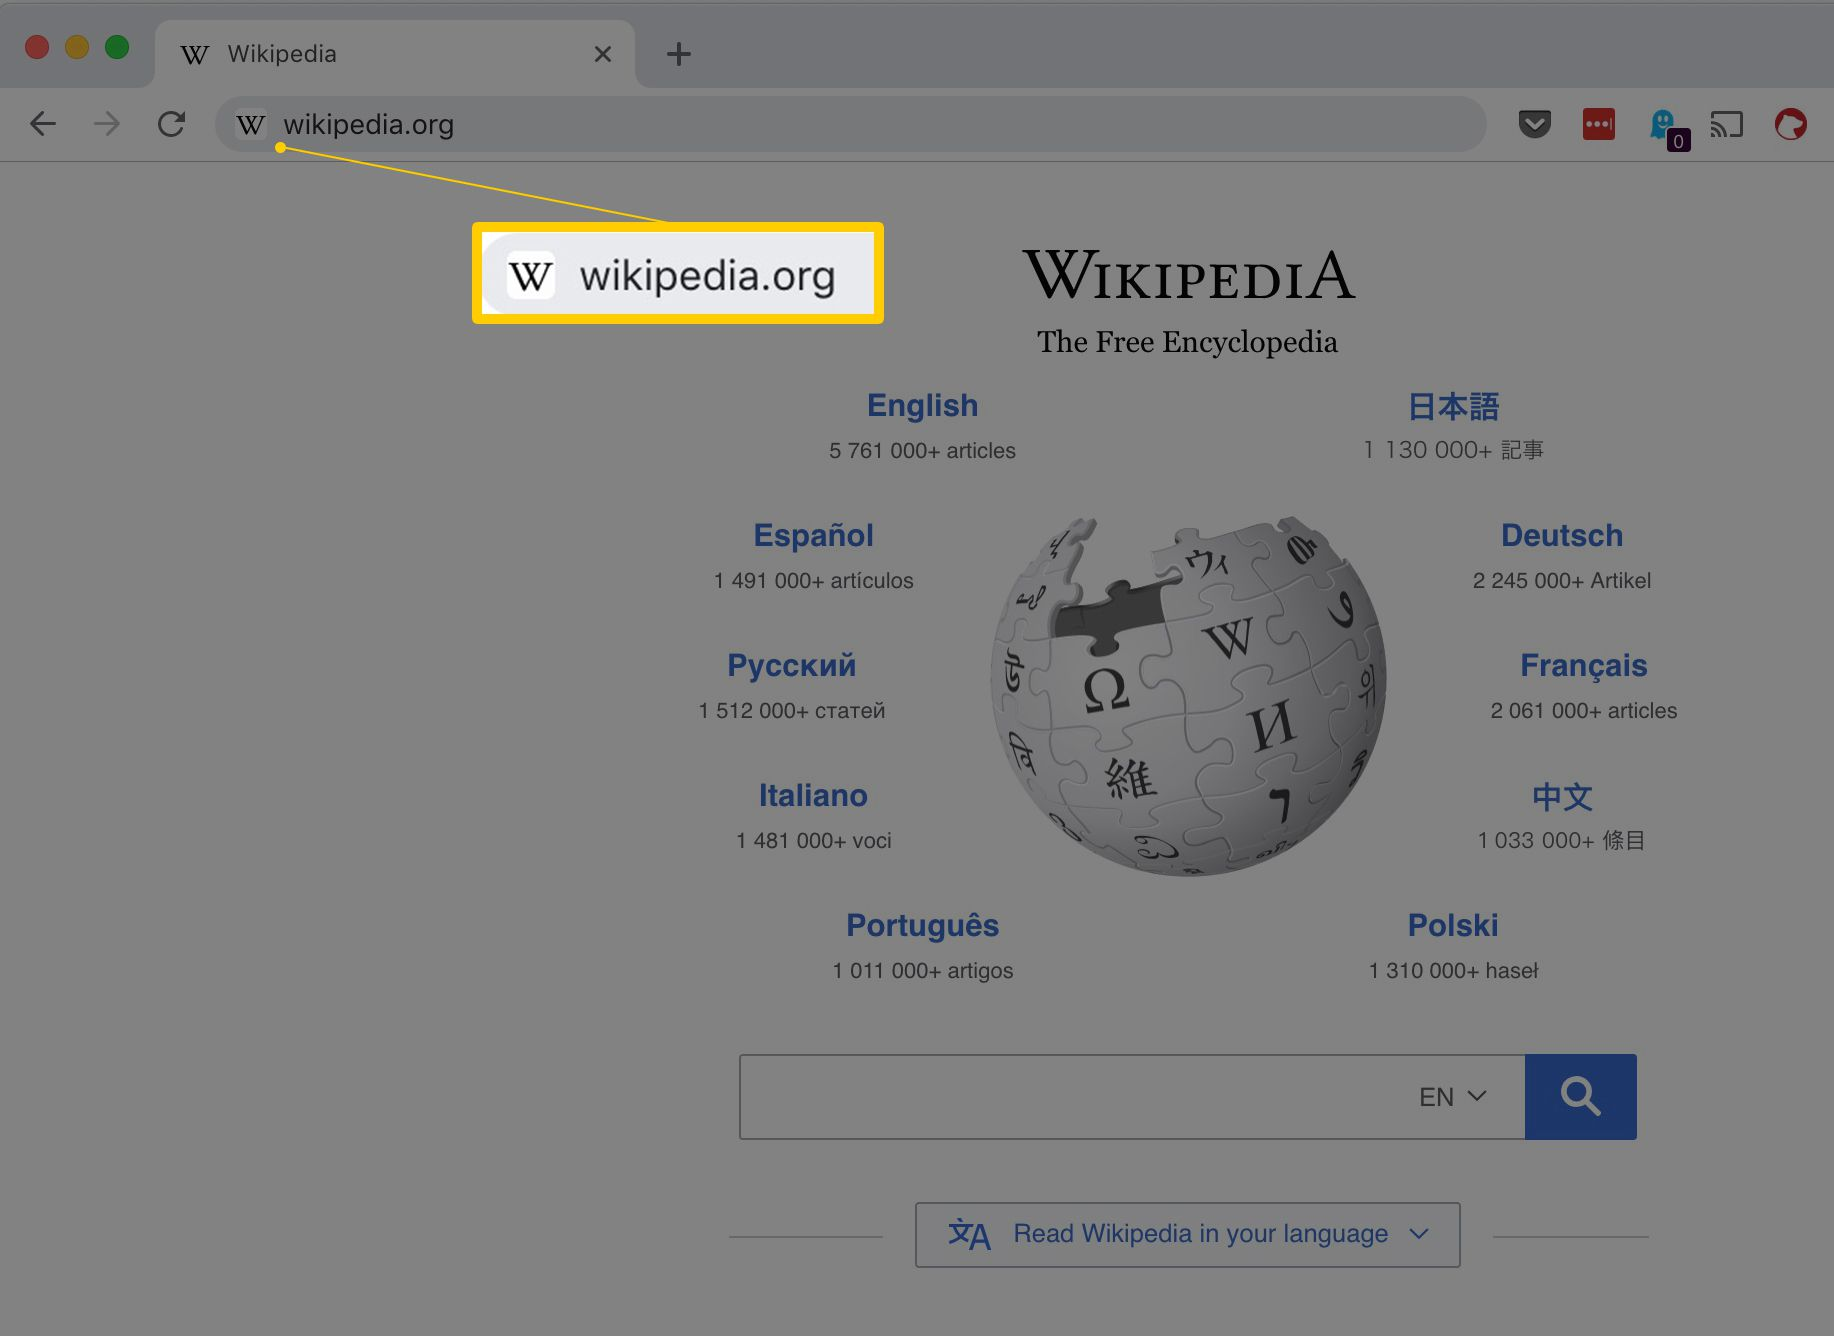 wikipedia.org in a web browser URL bar